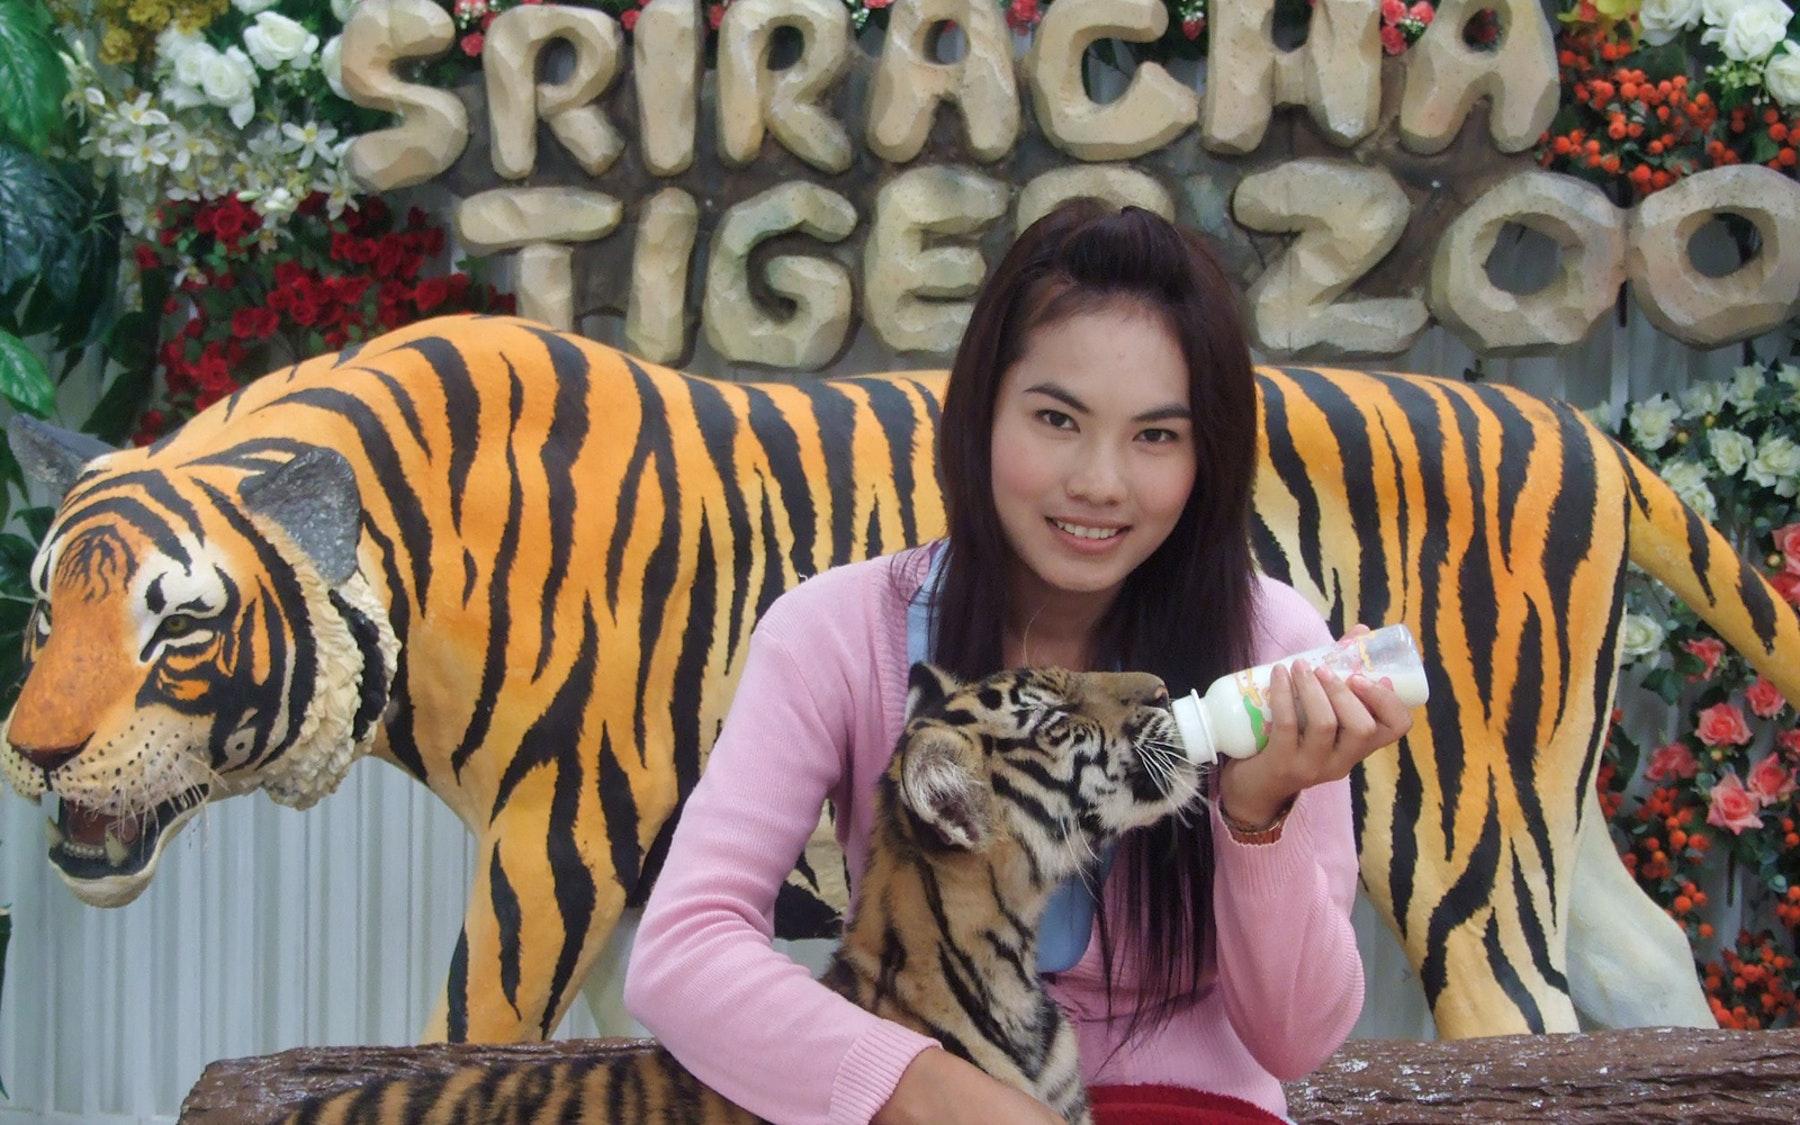 Book Sriracha Tiger Zoo Tickets | [COVID-19 Updated]